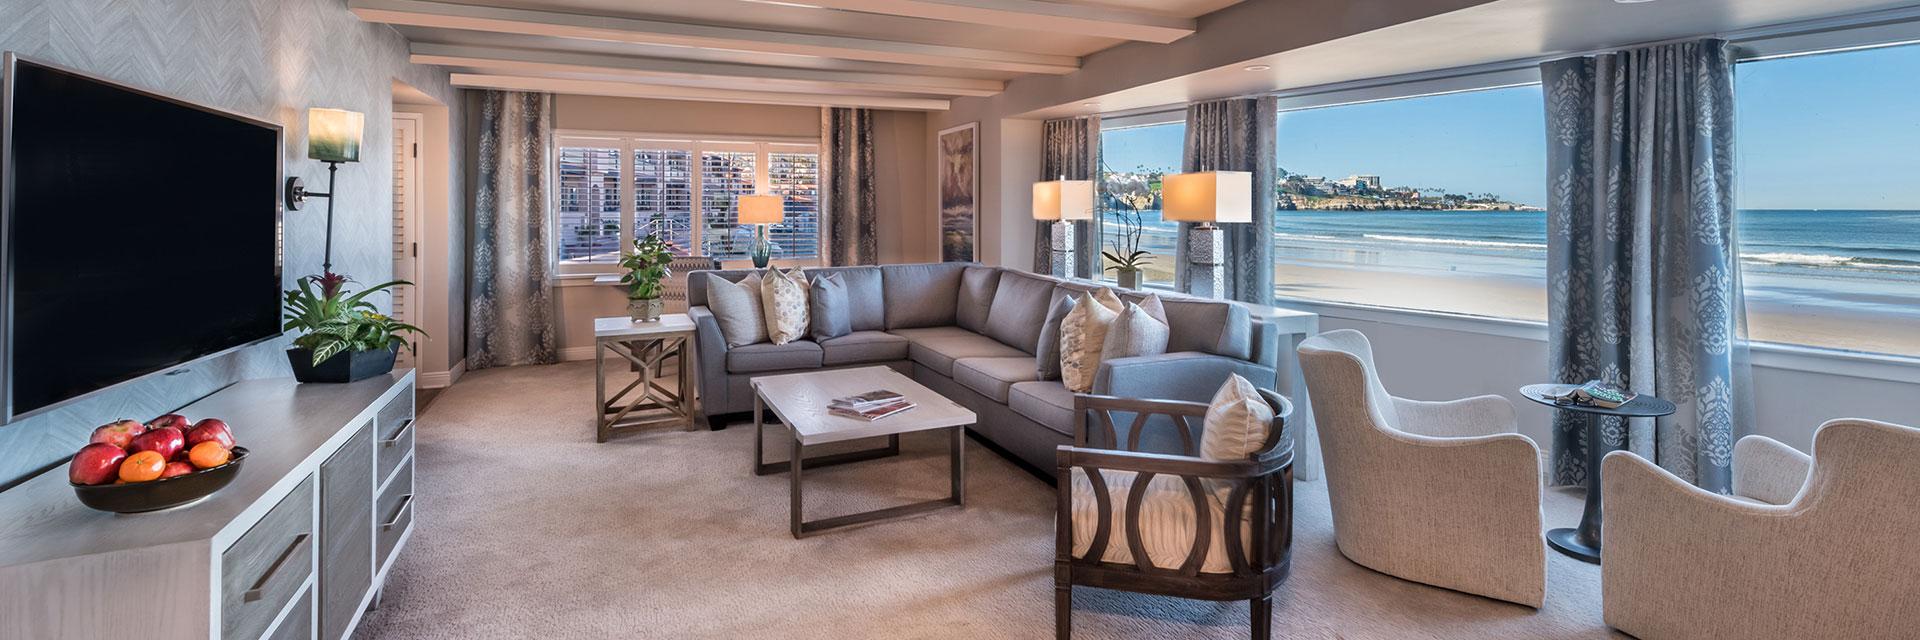 Rooms Suites at La Jolla Beach And Tennis Club, California